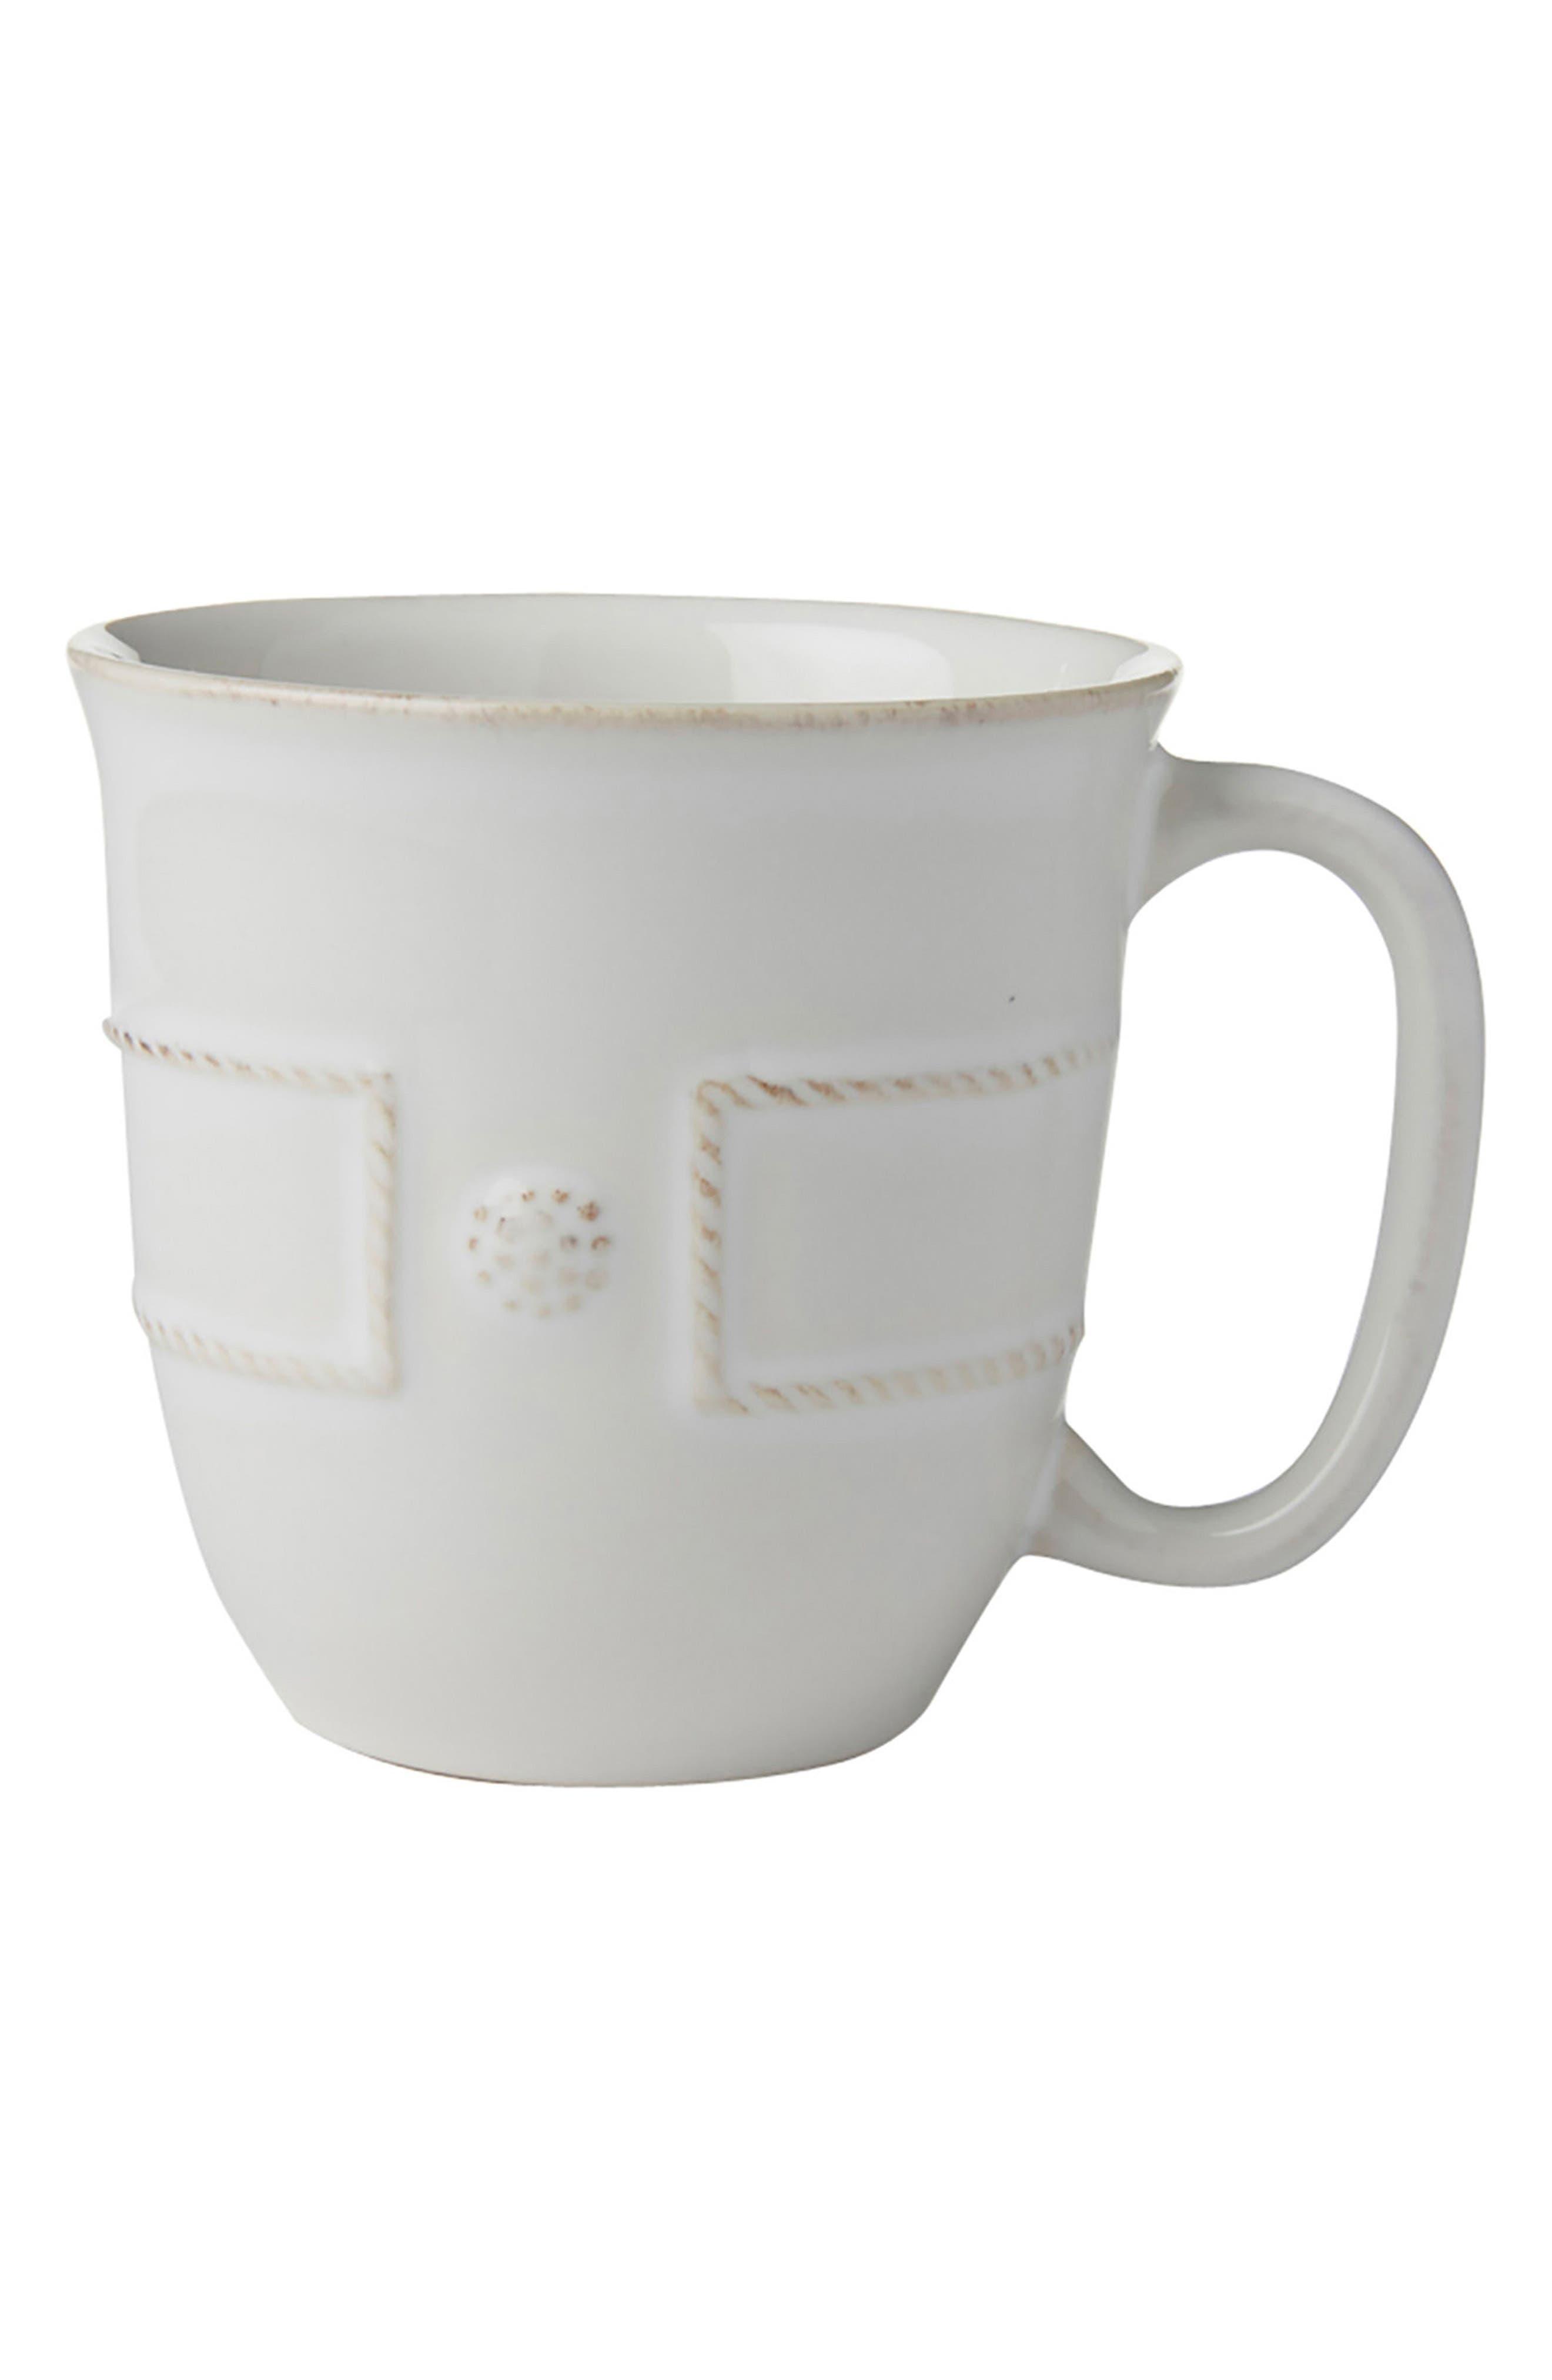 Juliska Berry & Thread Ceramic Cup